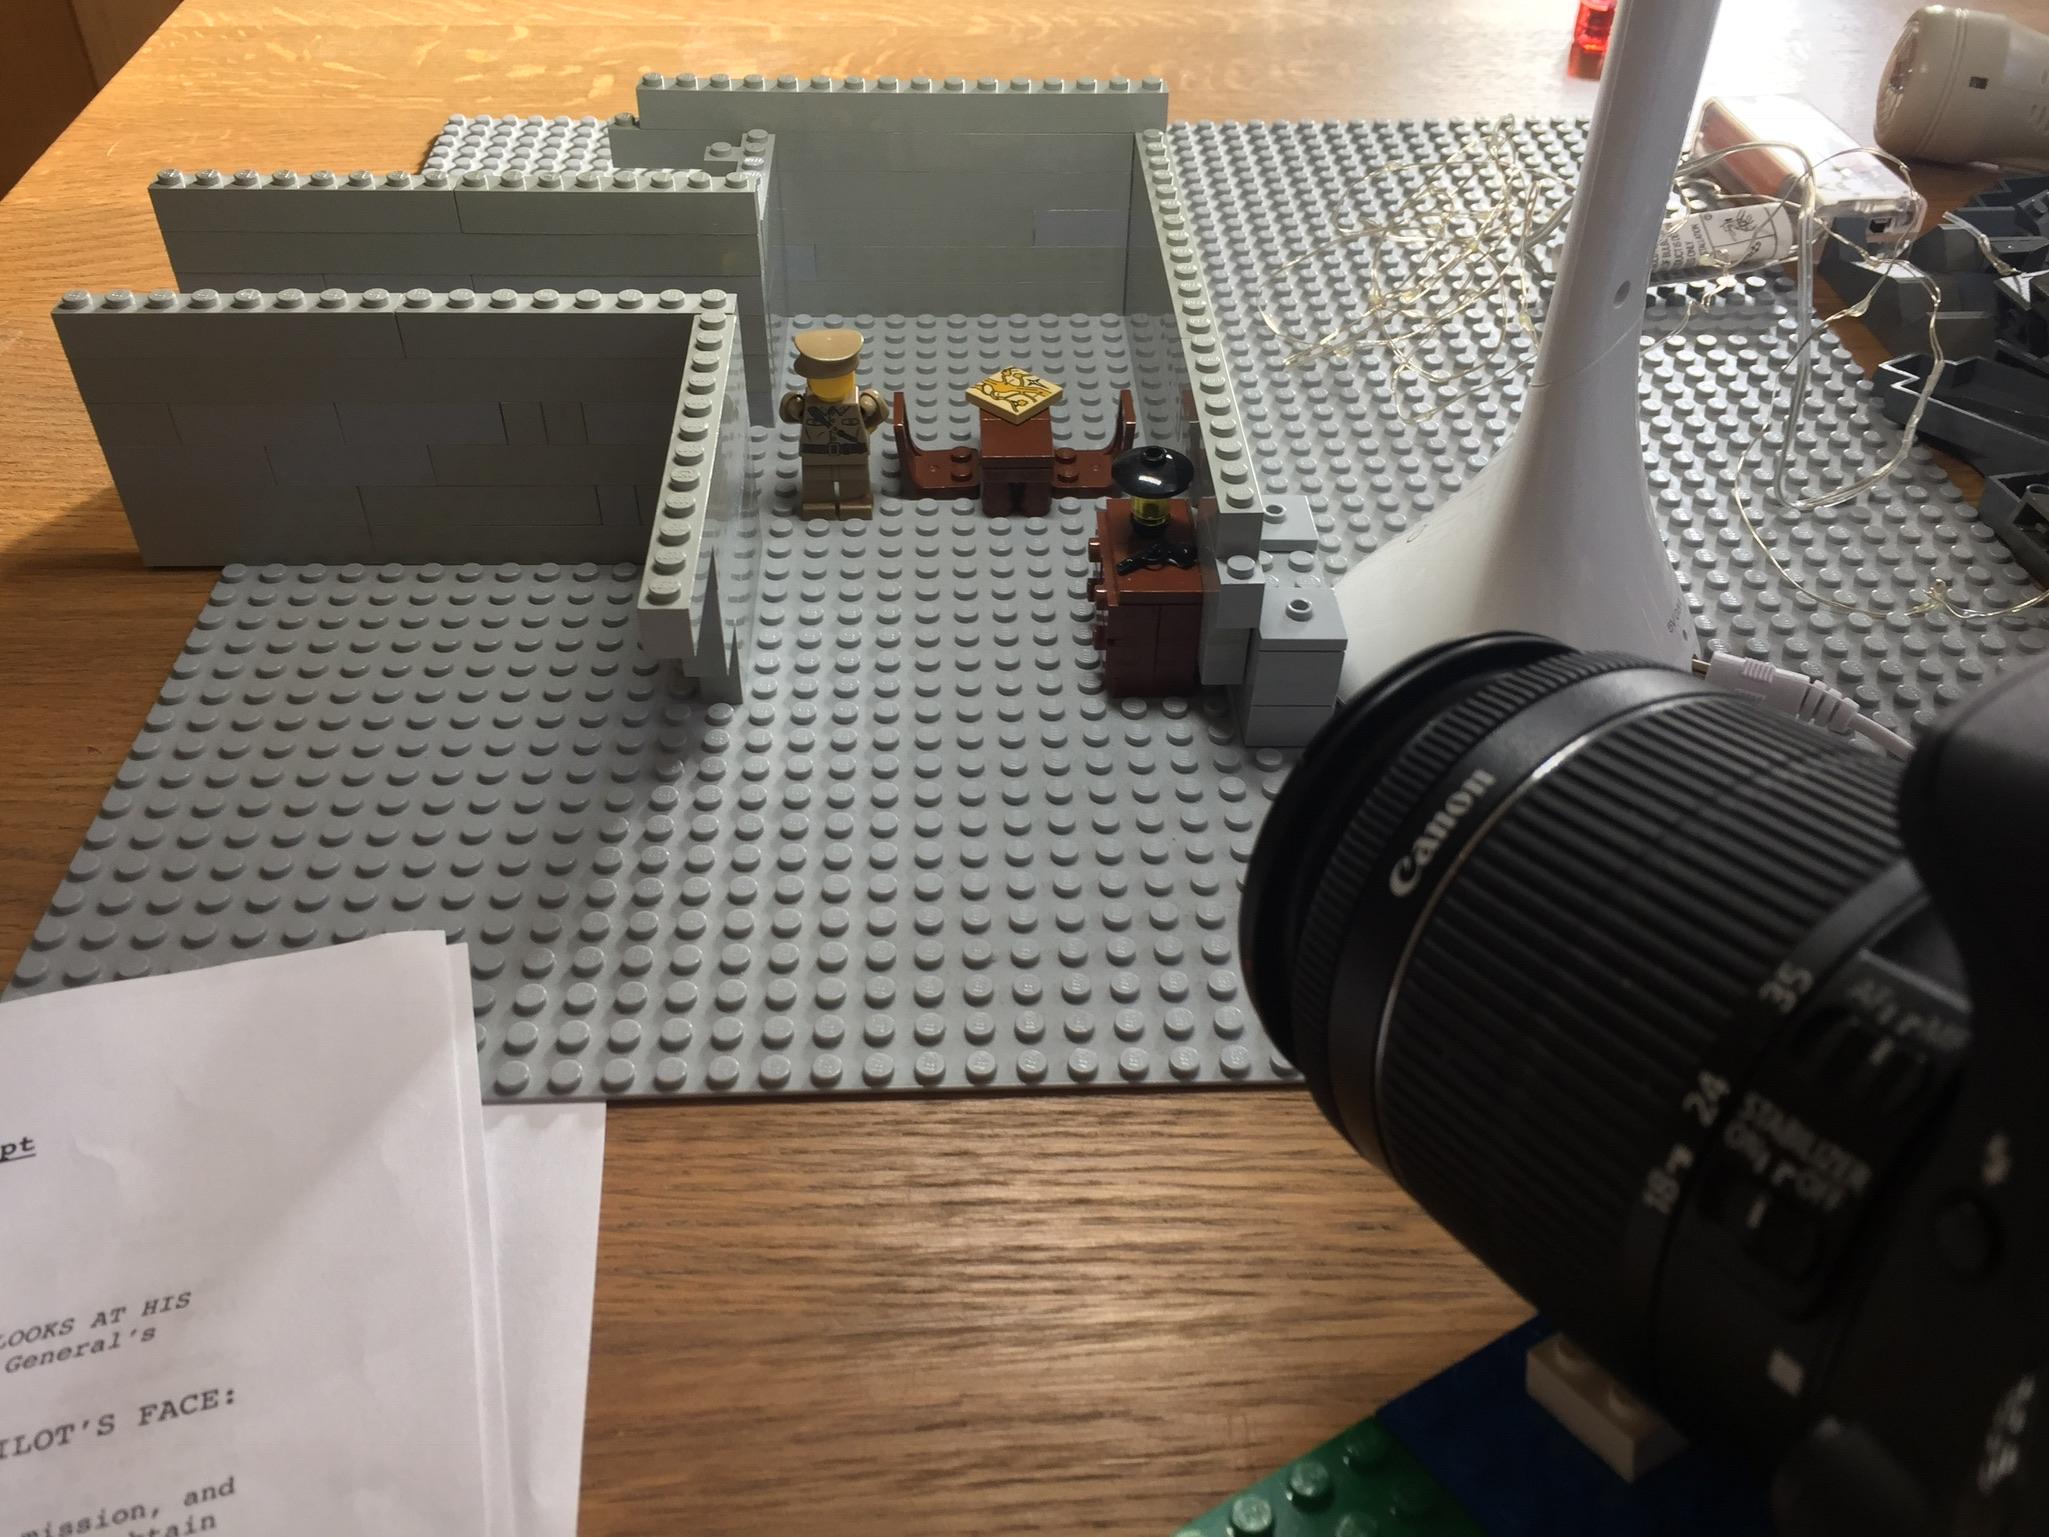 http://bricksafe.com/files/DragonBrickStudios/bim/ww1-brickfilm/IMG_0013.jpg